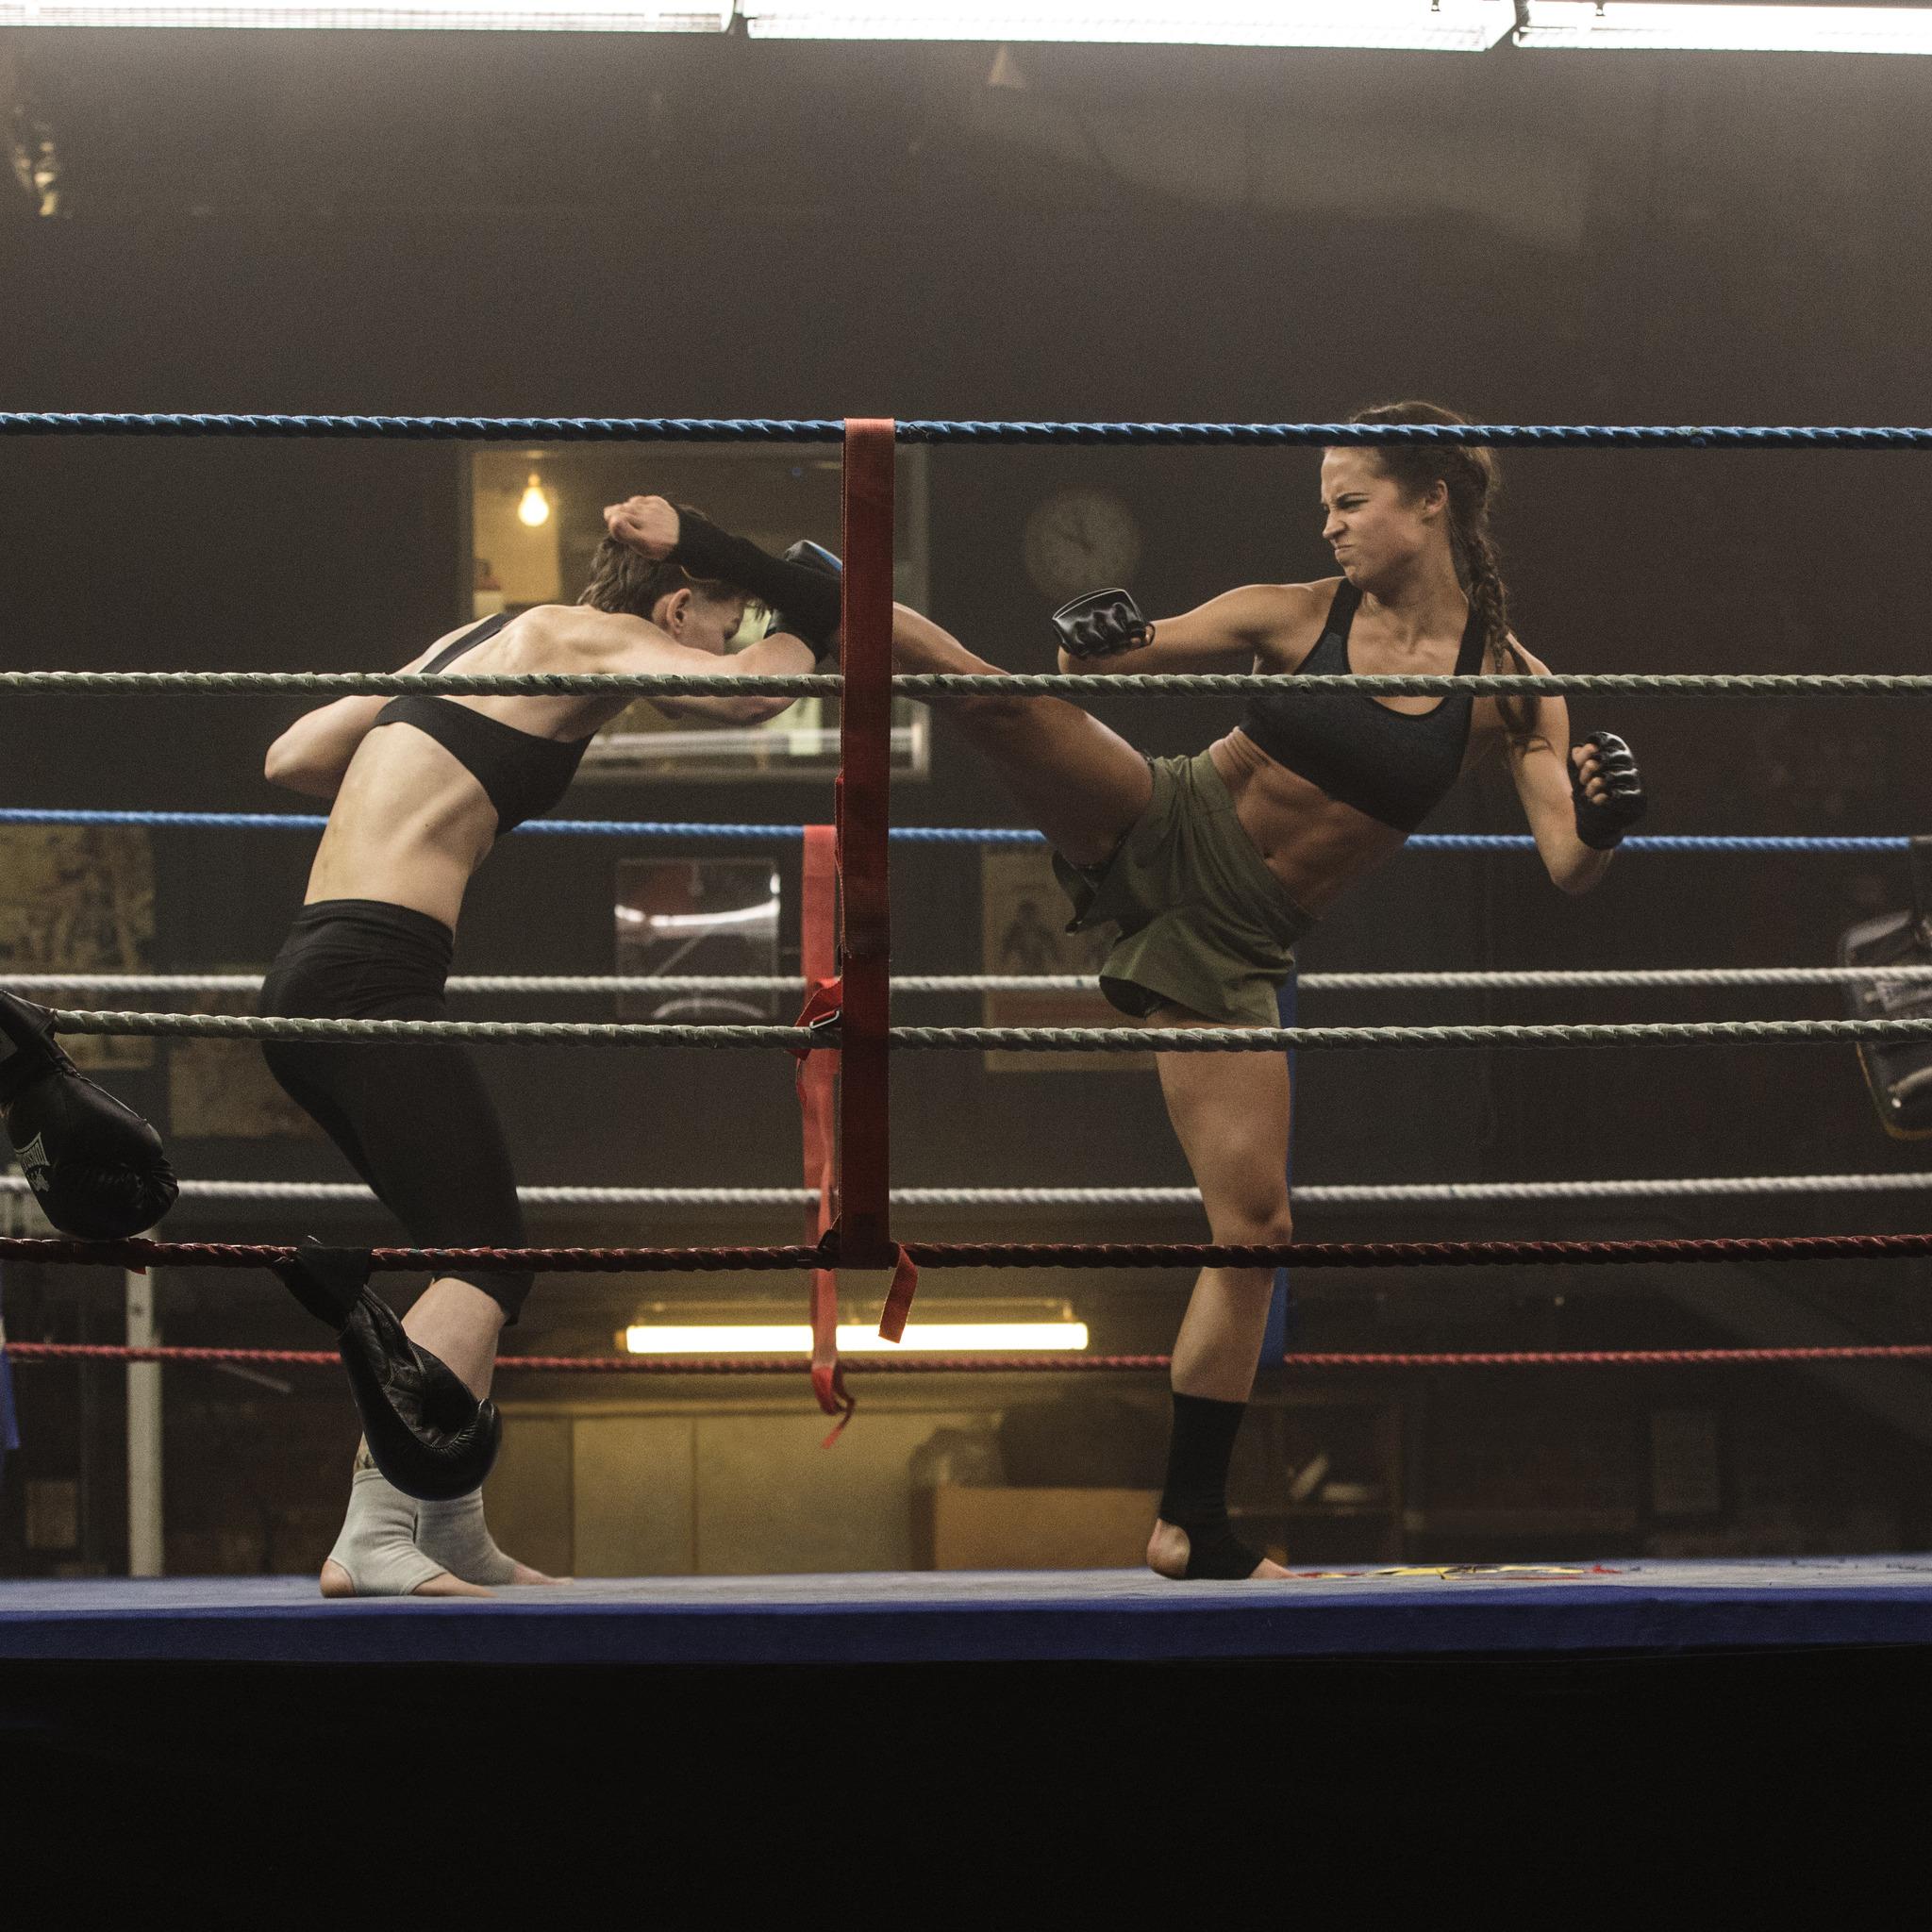 Alicia Vikander Tomb Raider 2018 Movie Full Hd Wallpaper: 2048x2048 Tomb Raider 2018 Movie Alicia Vikander Doing